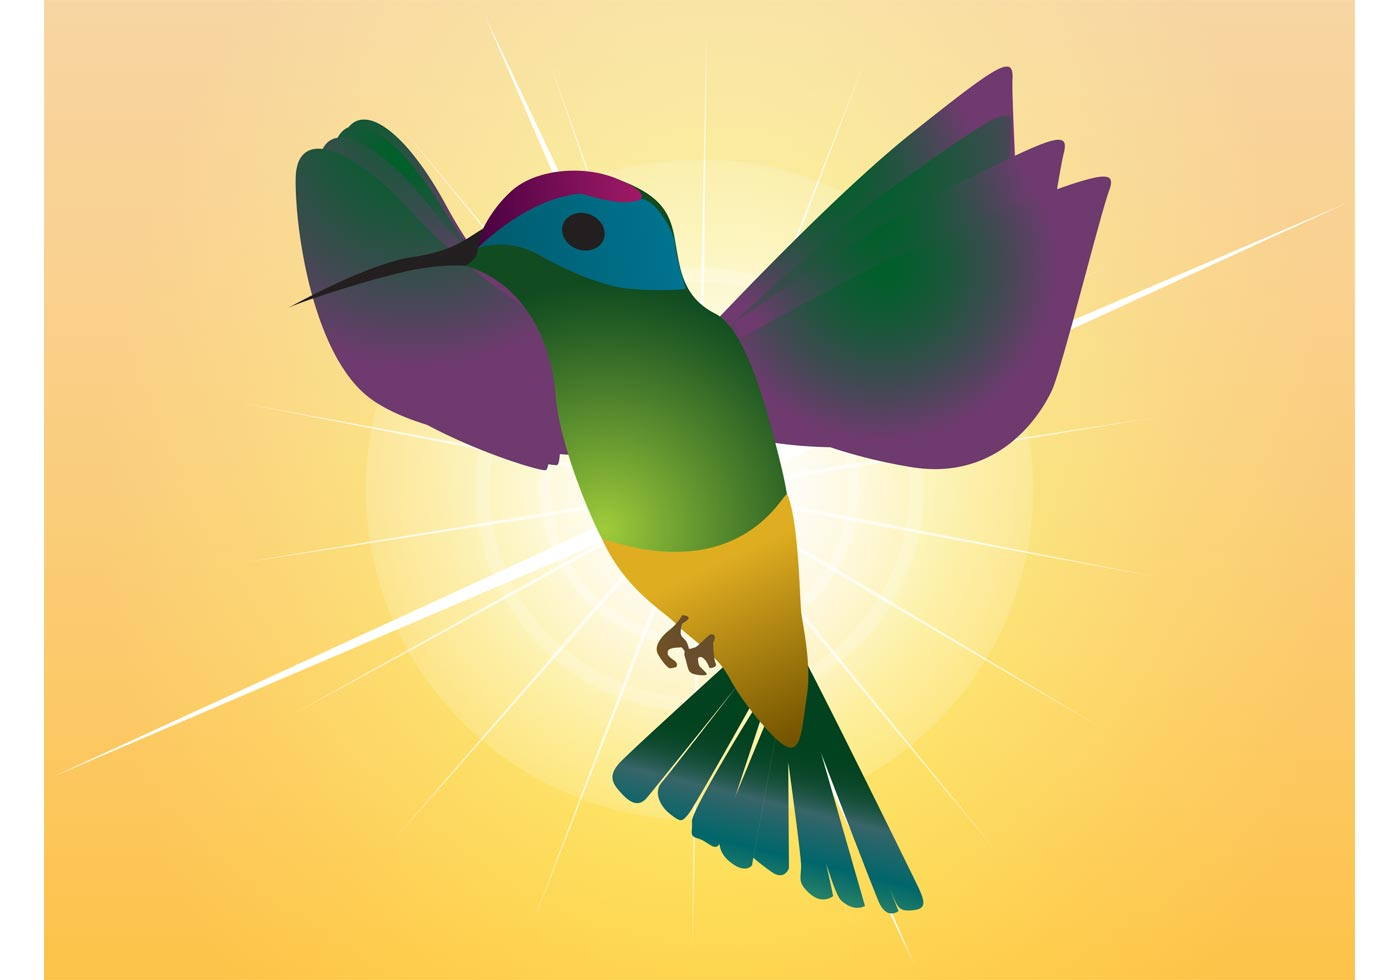 humming bird free vector art 11876 free downloads